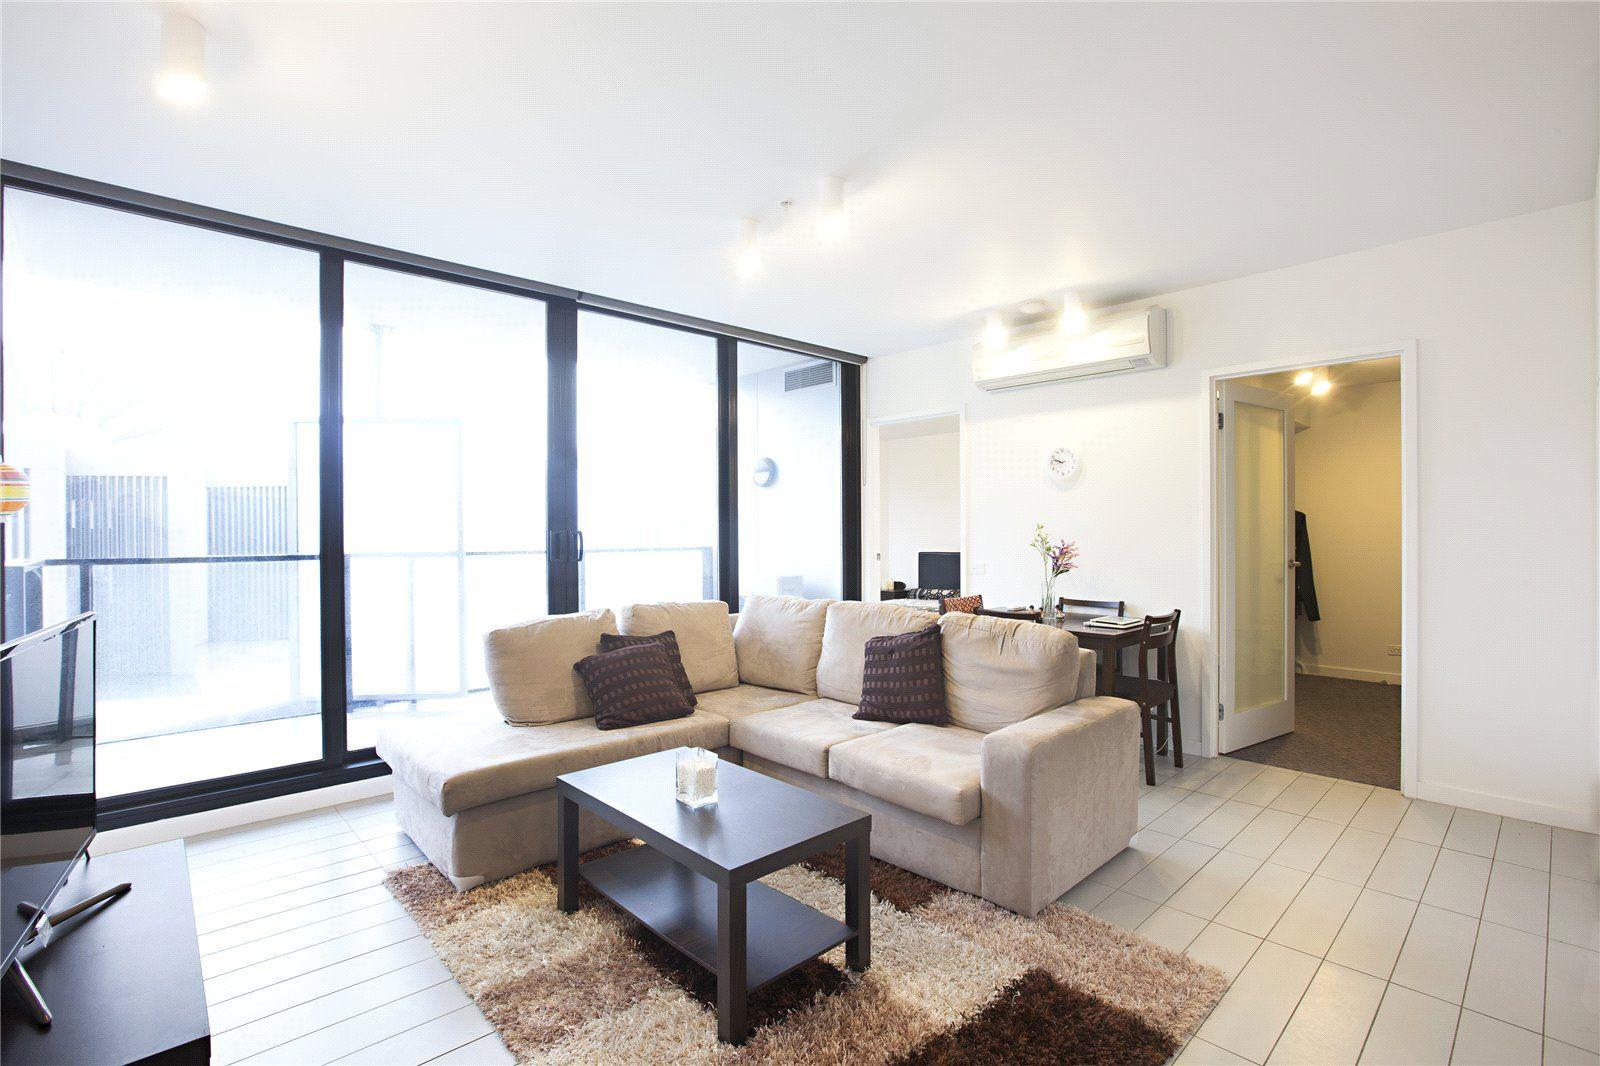 Lacrosse: 4th Floor - Charming Docklands Abode!